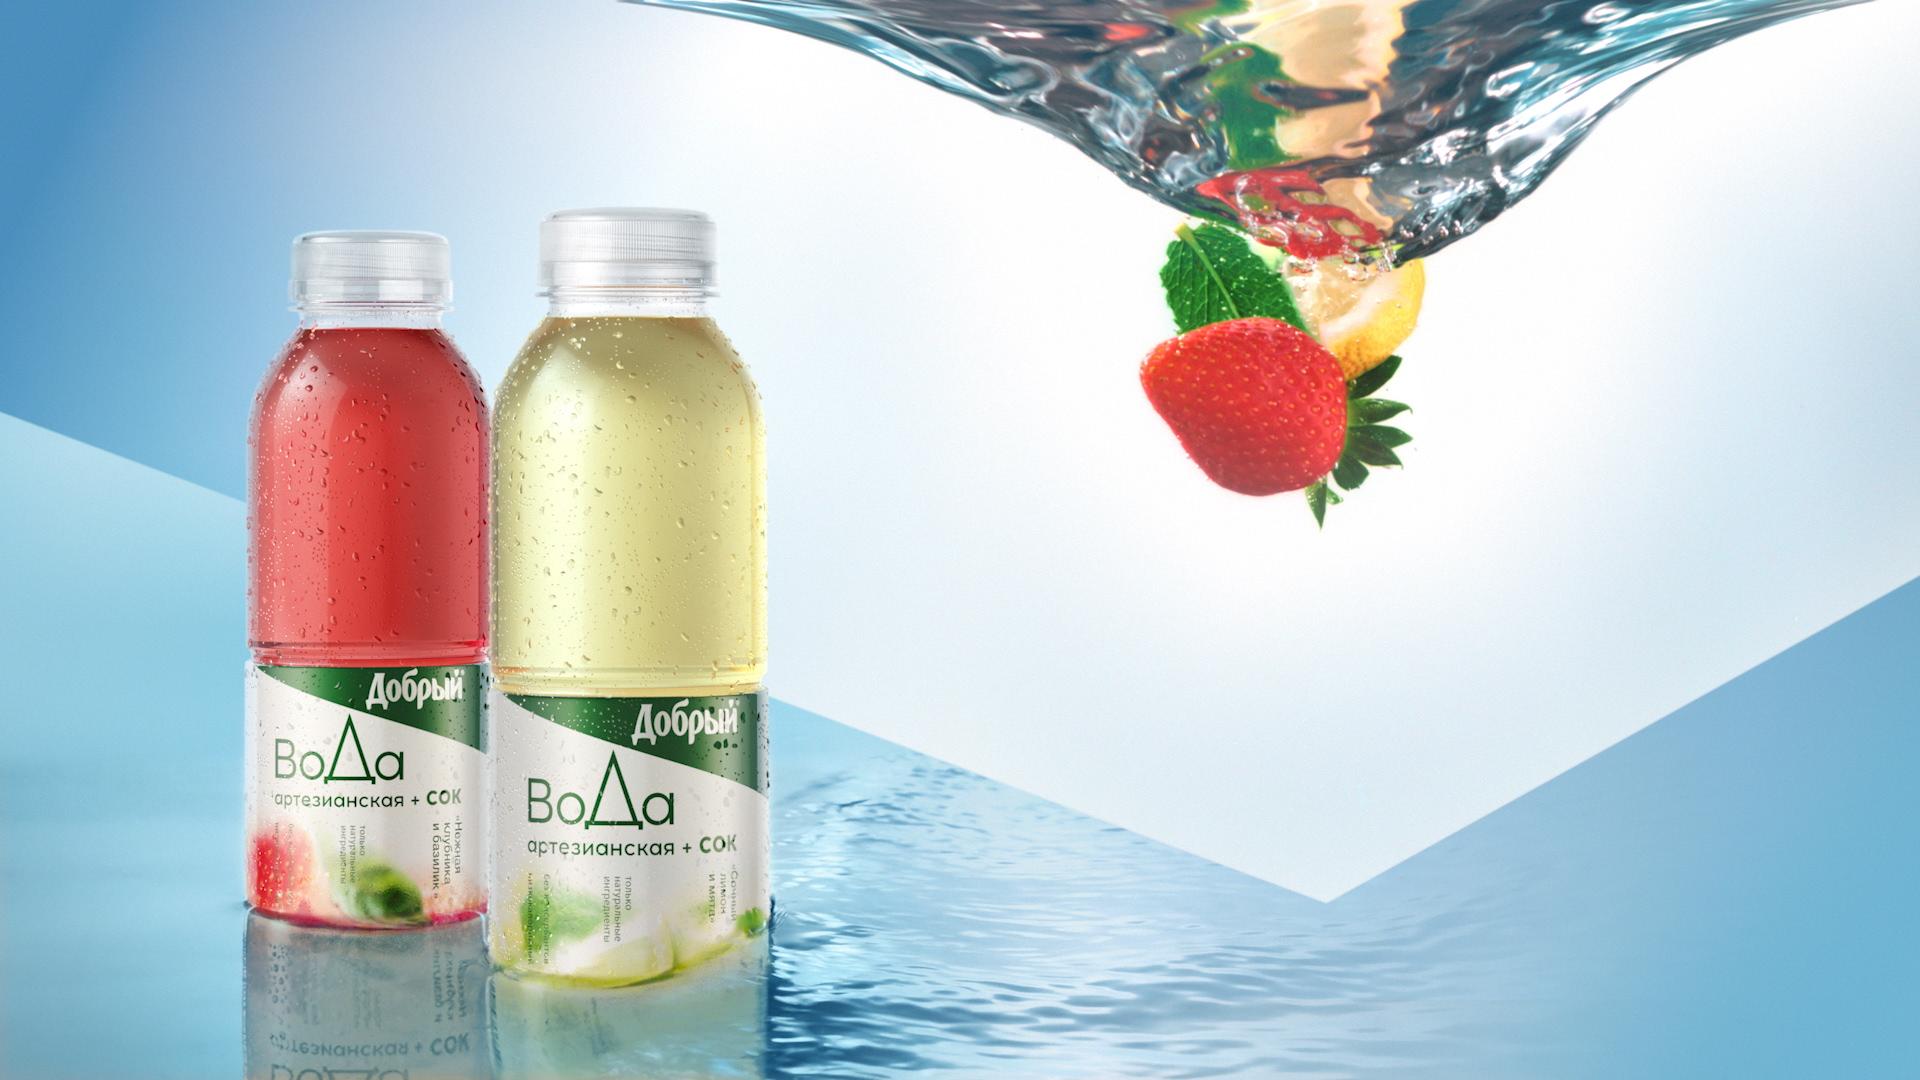 portfolio/dobry-water-juice/dobry_waterjuice_jorrit-stollman_14.jpg